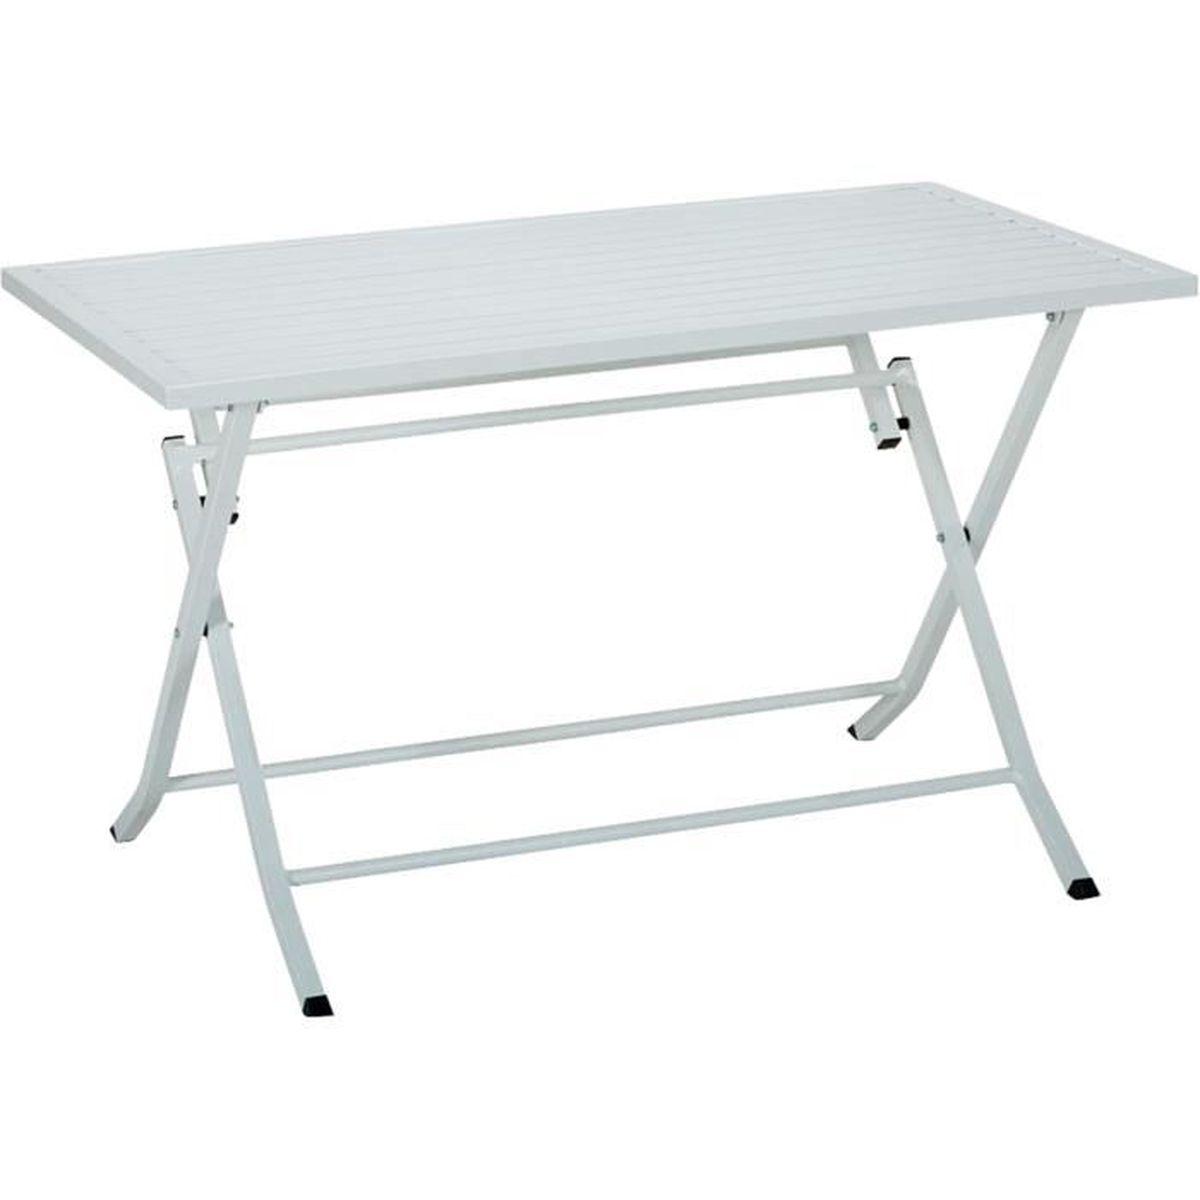 Blanco Jardin Table de jardin pliante blanche en aluminium ...